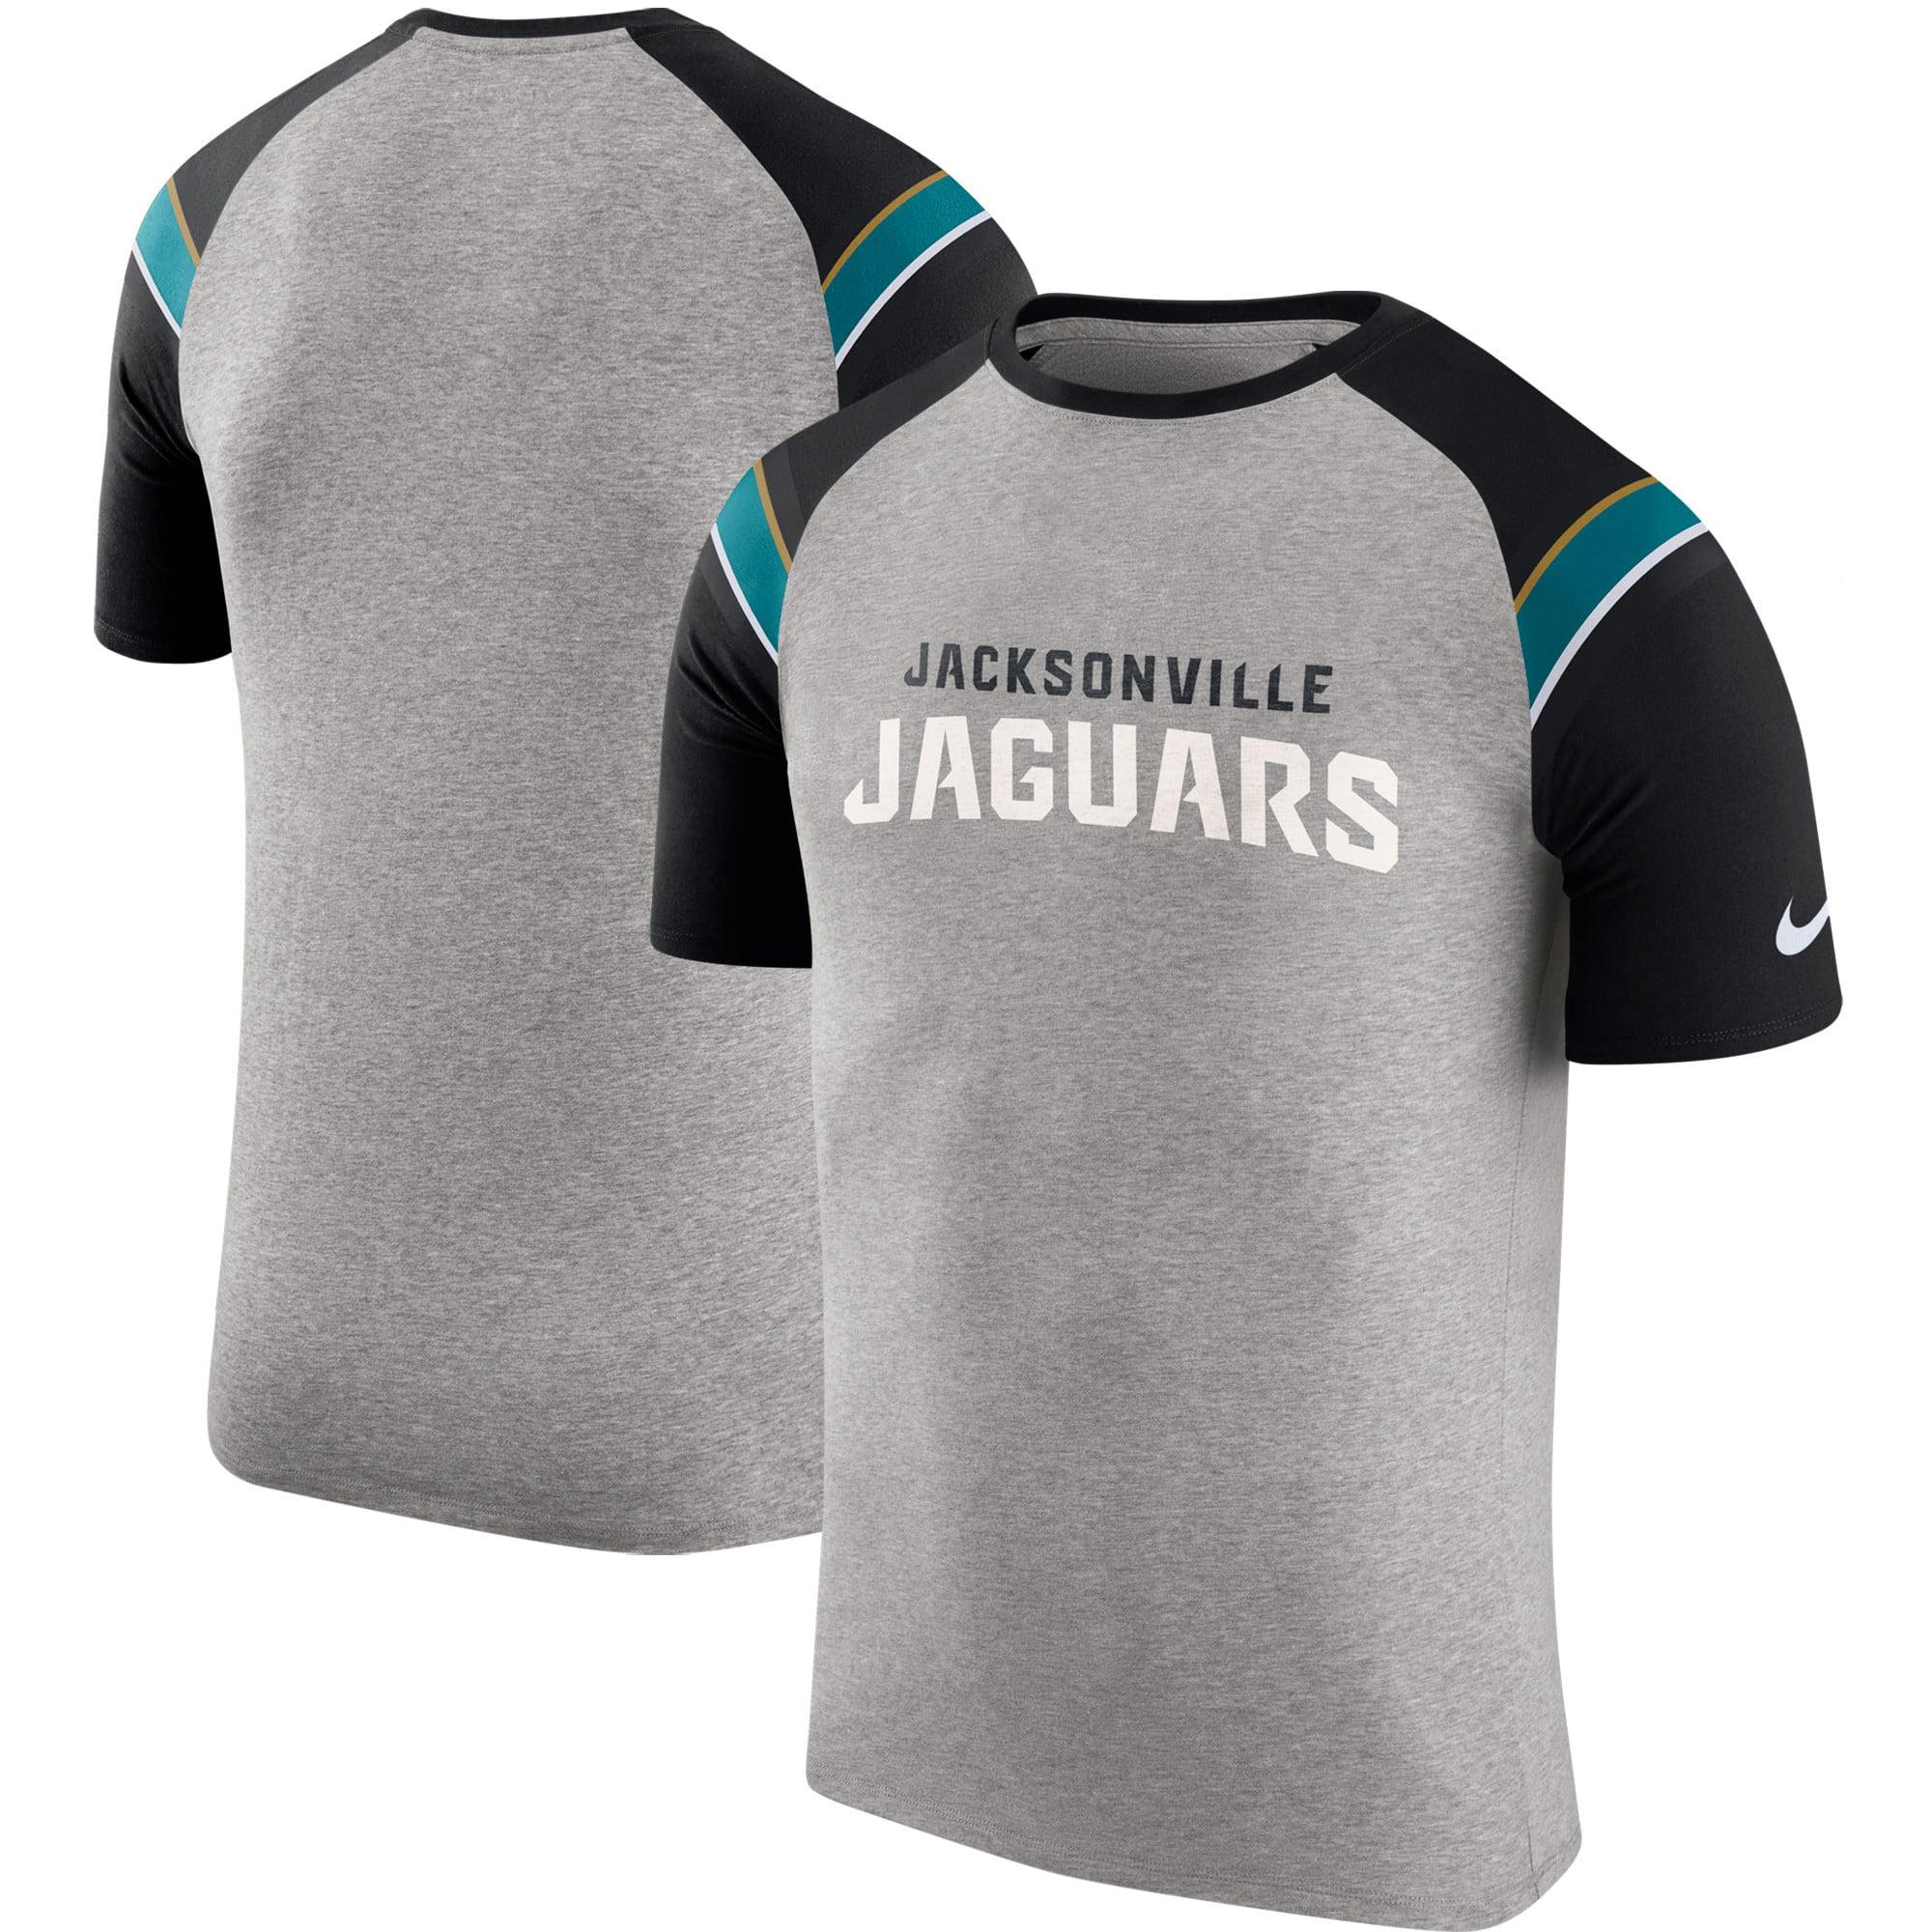 Jacksonville Jaguars Nike Enzyme Shoulder Stripe Raglan T-Shirt - Heathered Gray